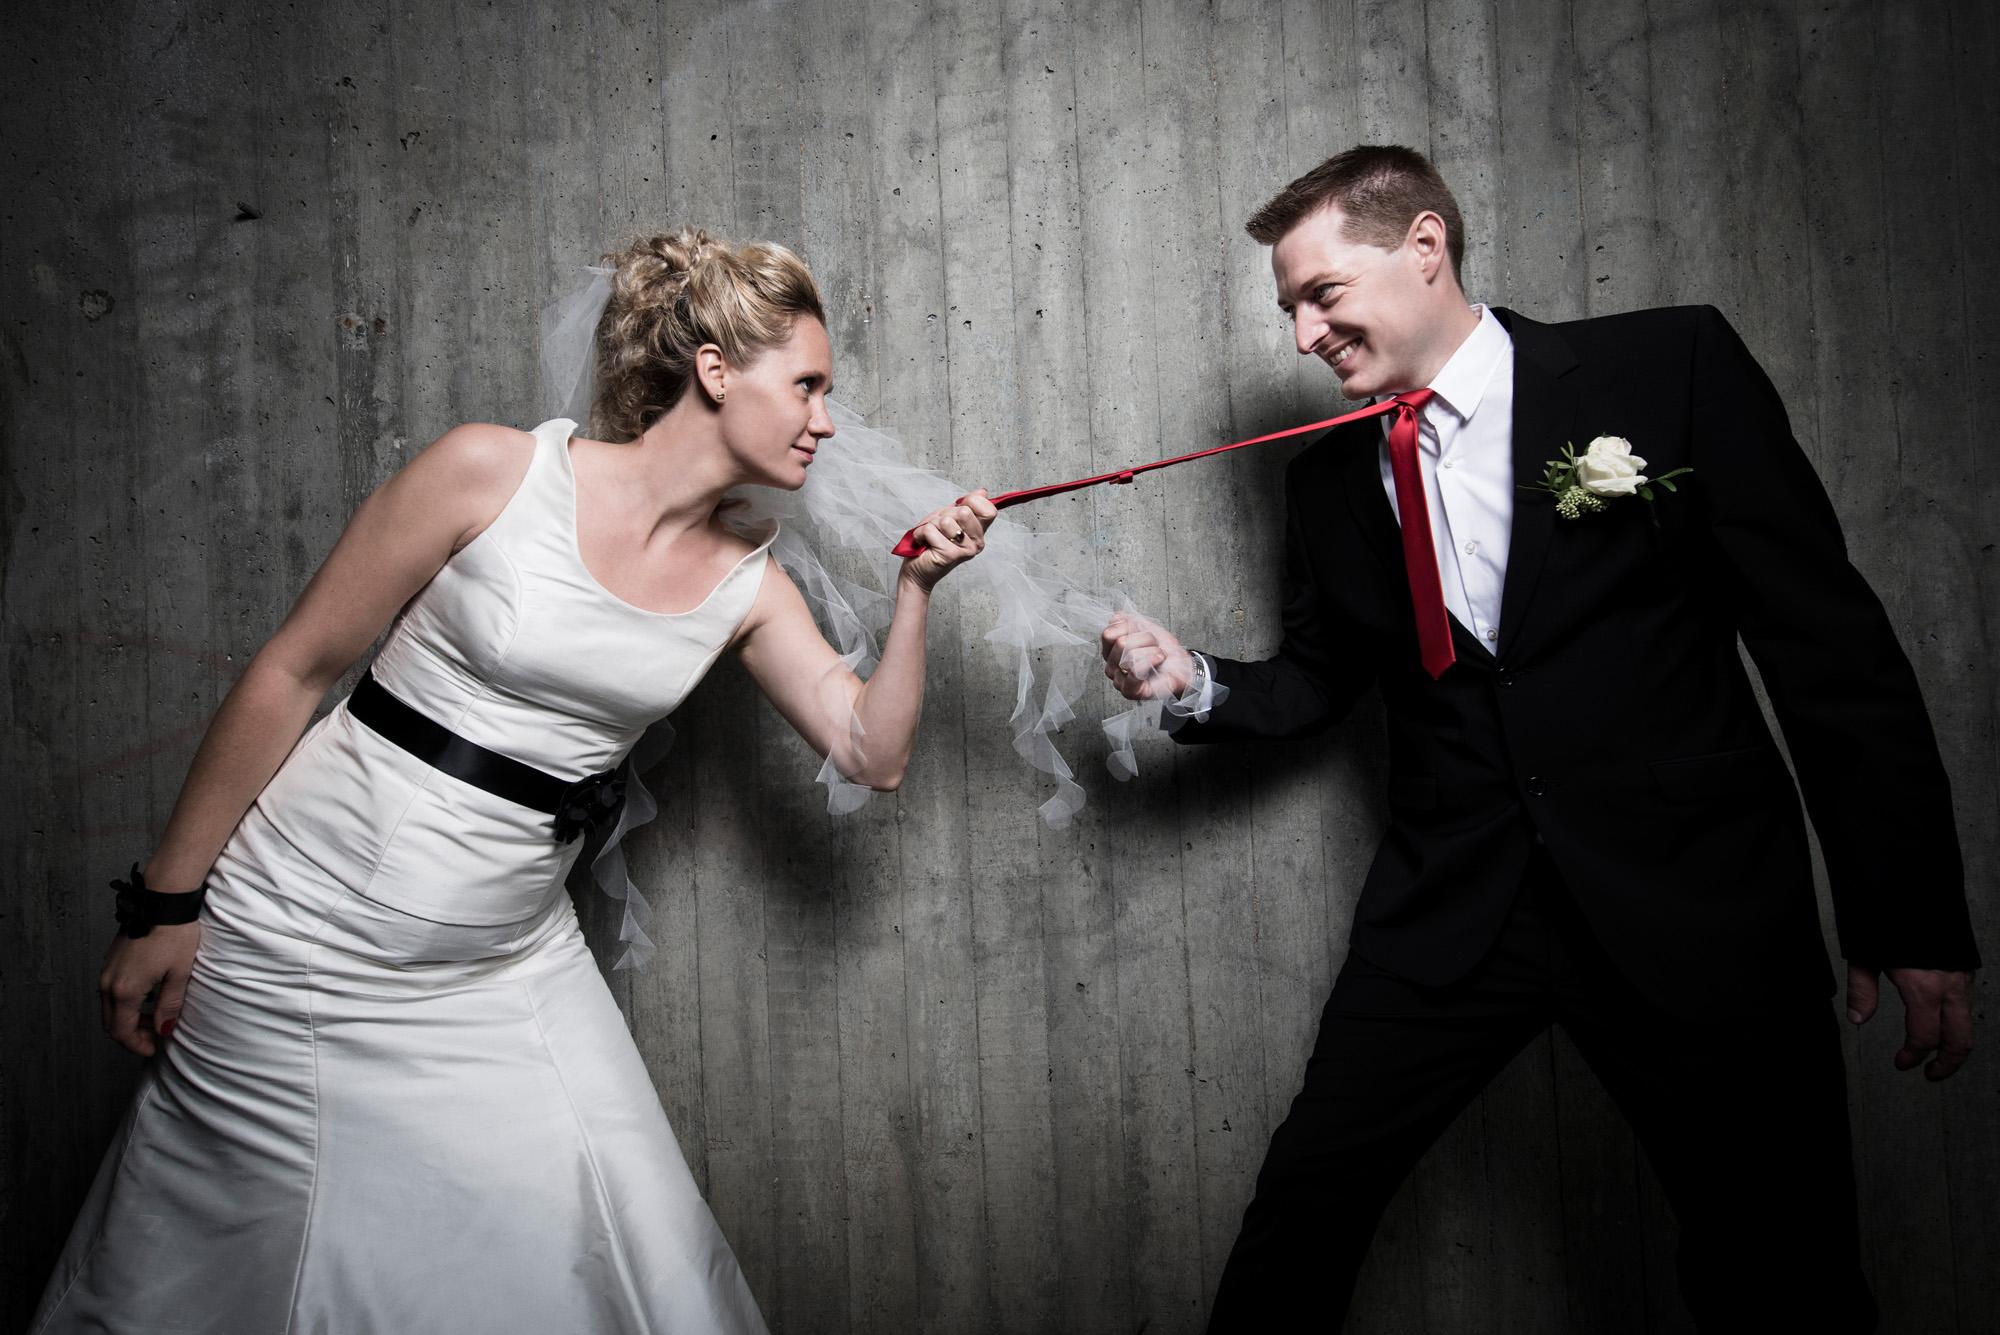 Sjov & anderledes bryllupsfotografering